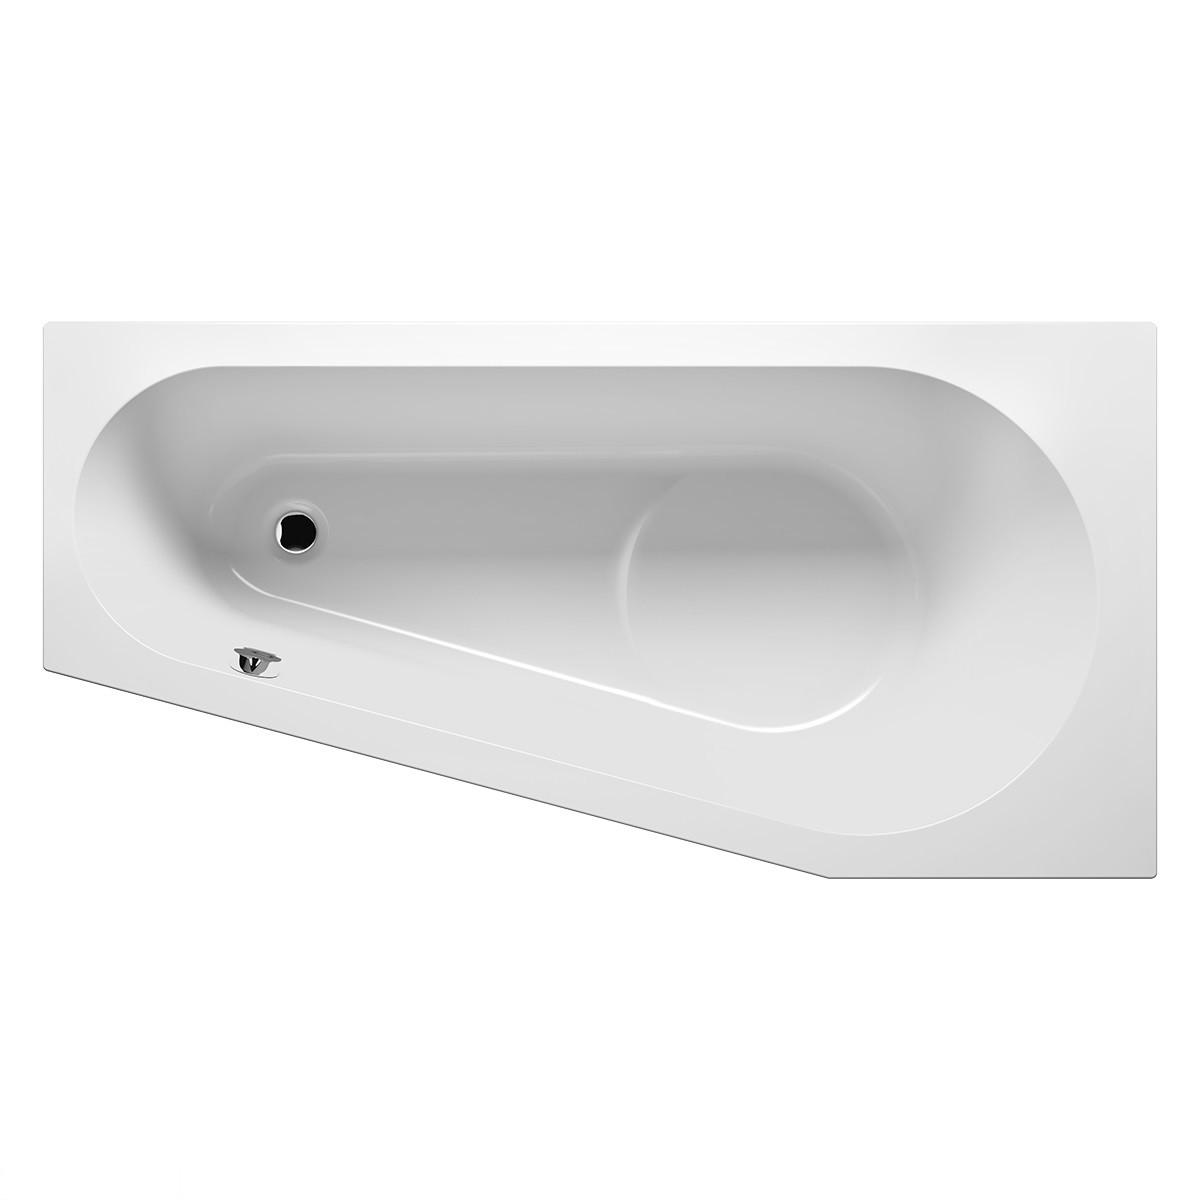 Акриловая ванна RIHO Delta BB8200500000000 160 R правосторонняя